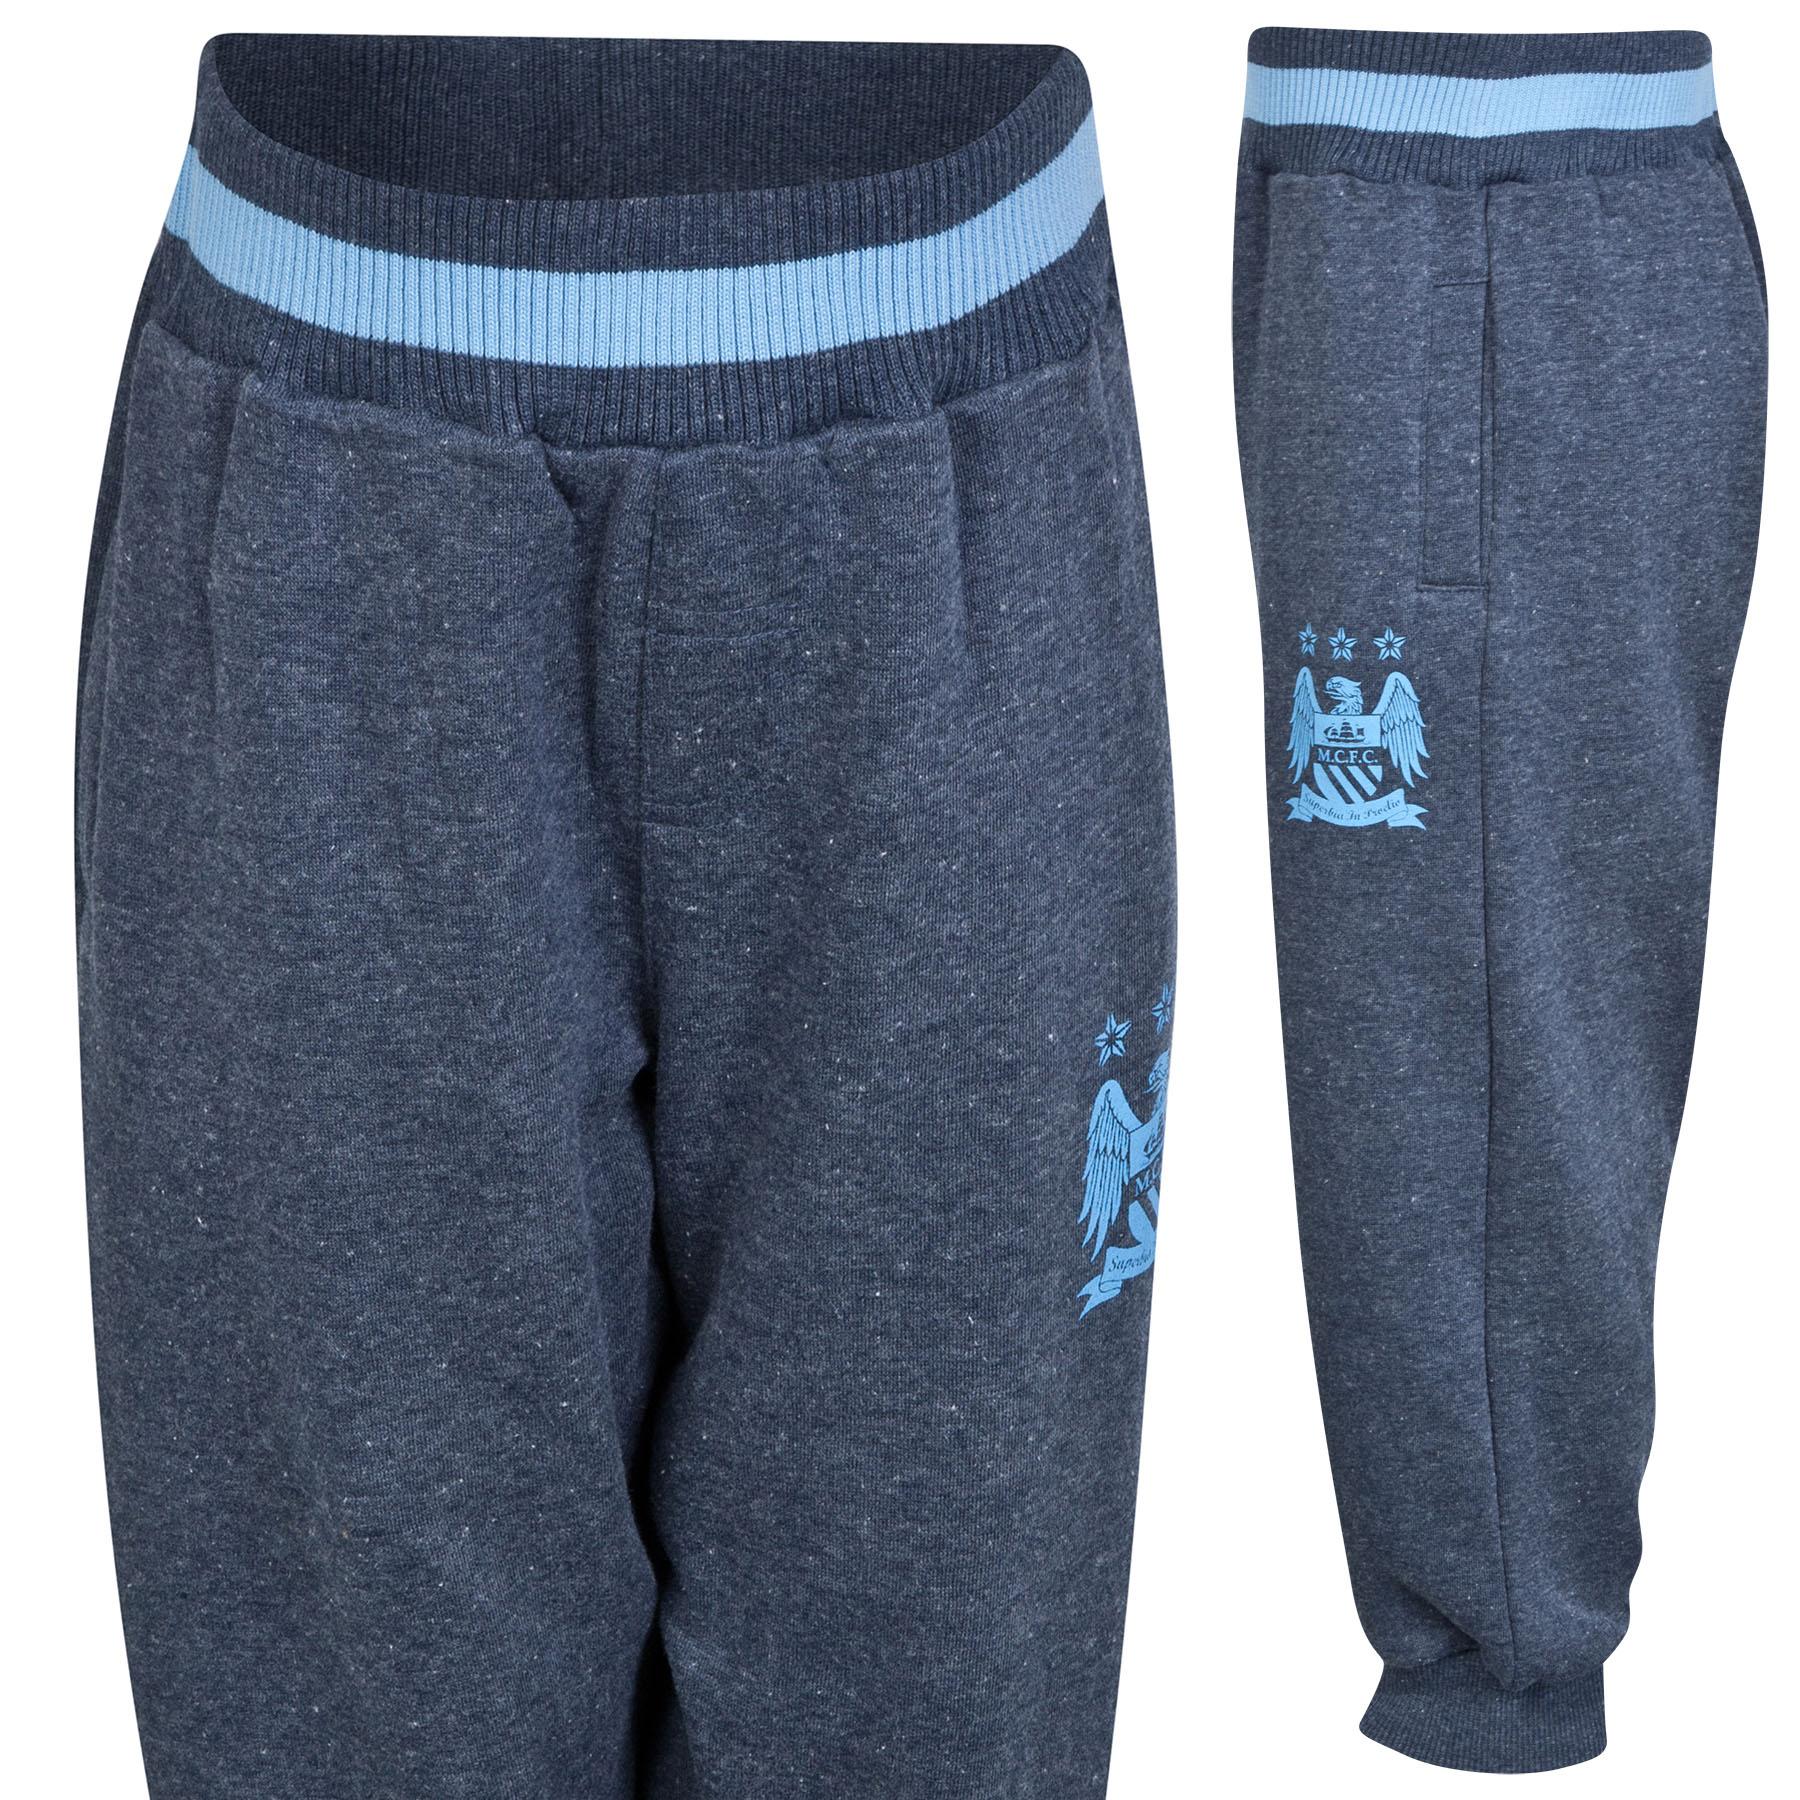 Manchester City Essential Jog Pant - Navy - Infant Boys